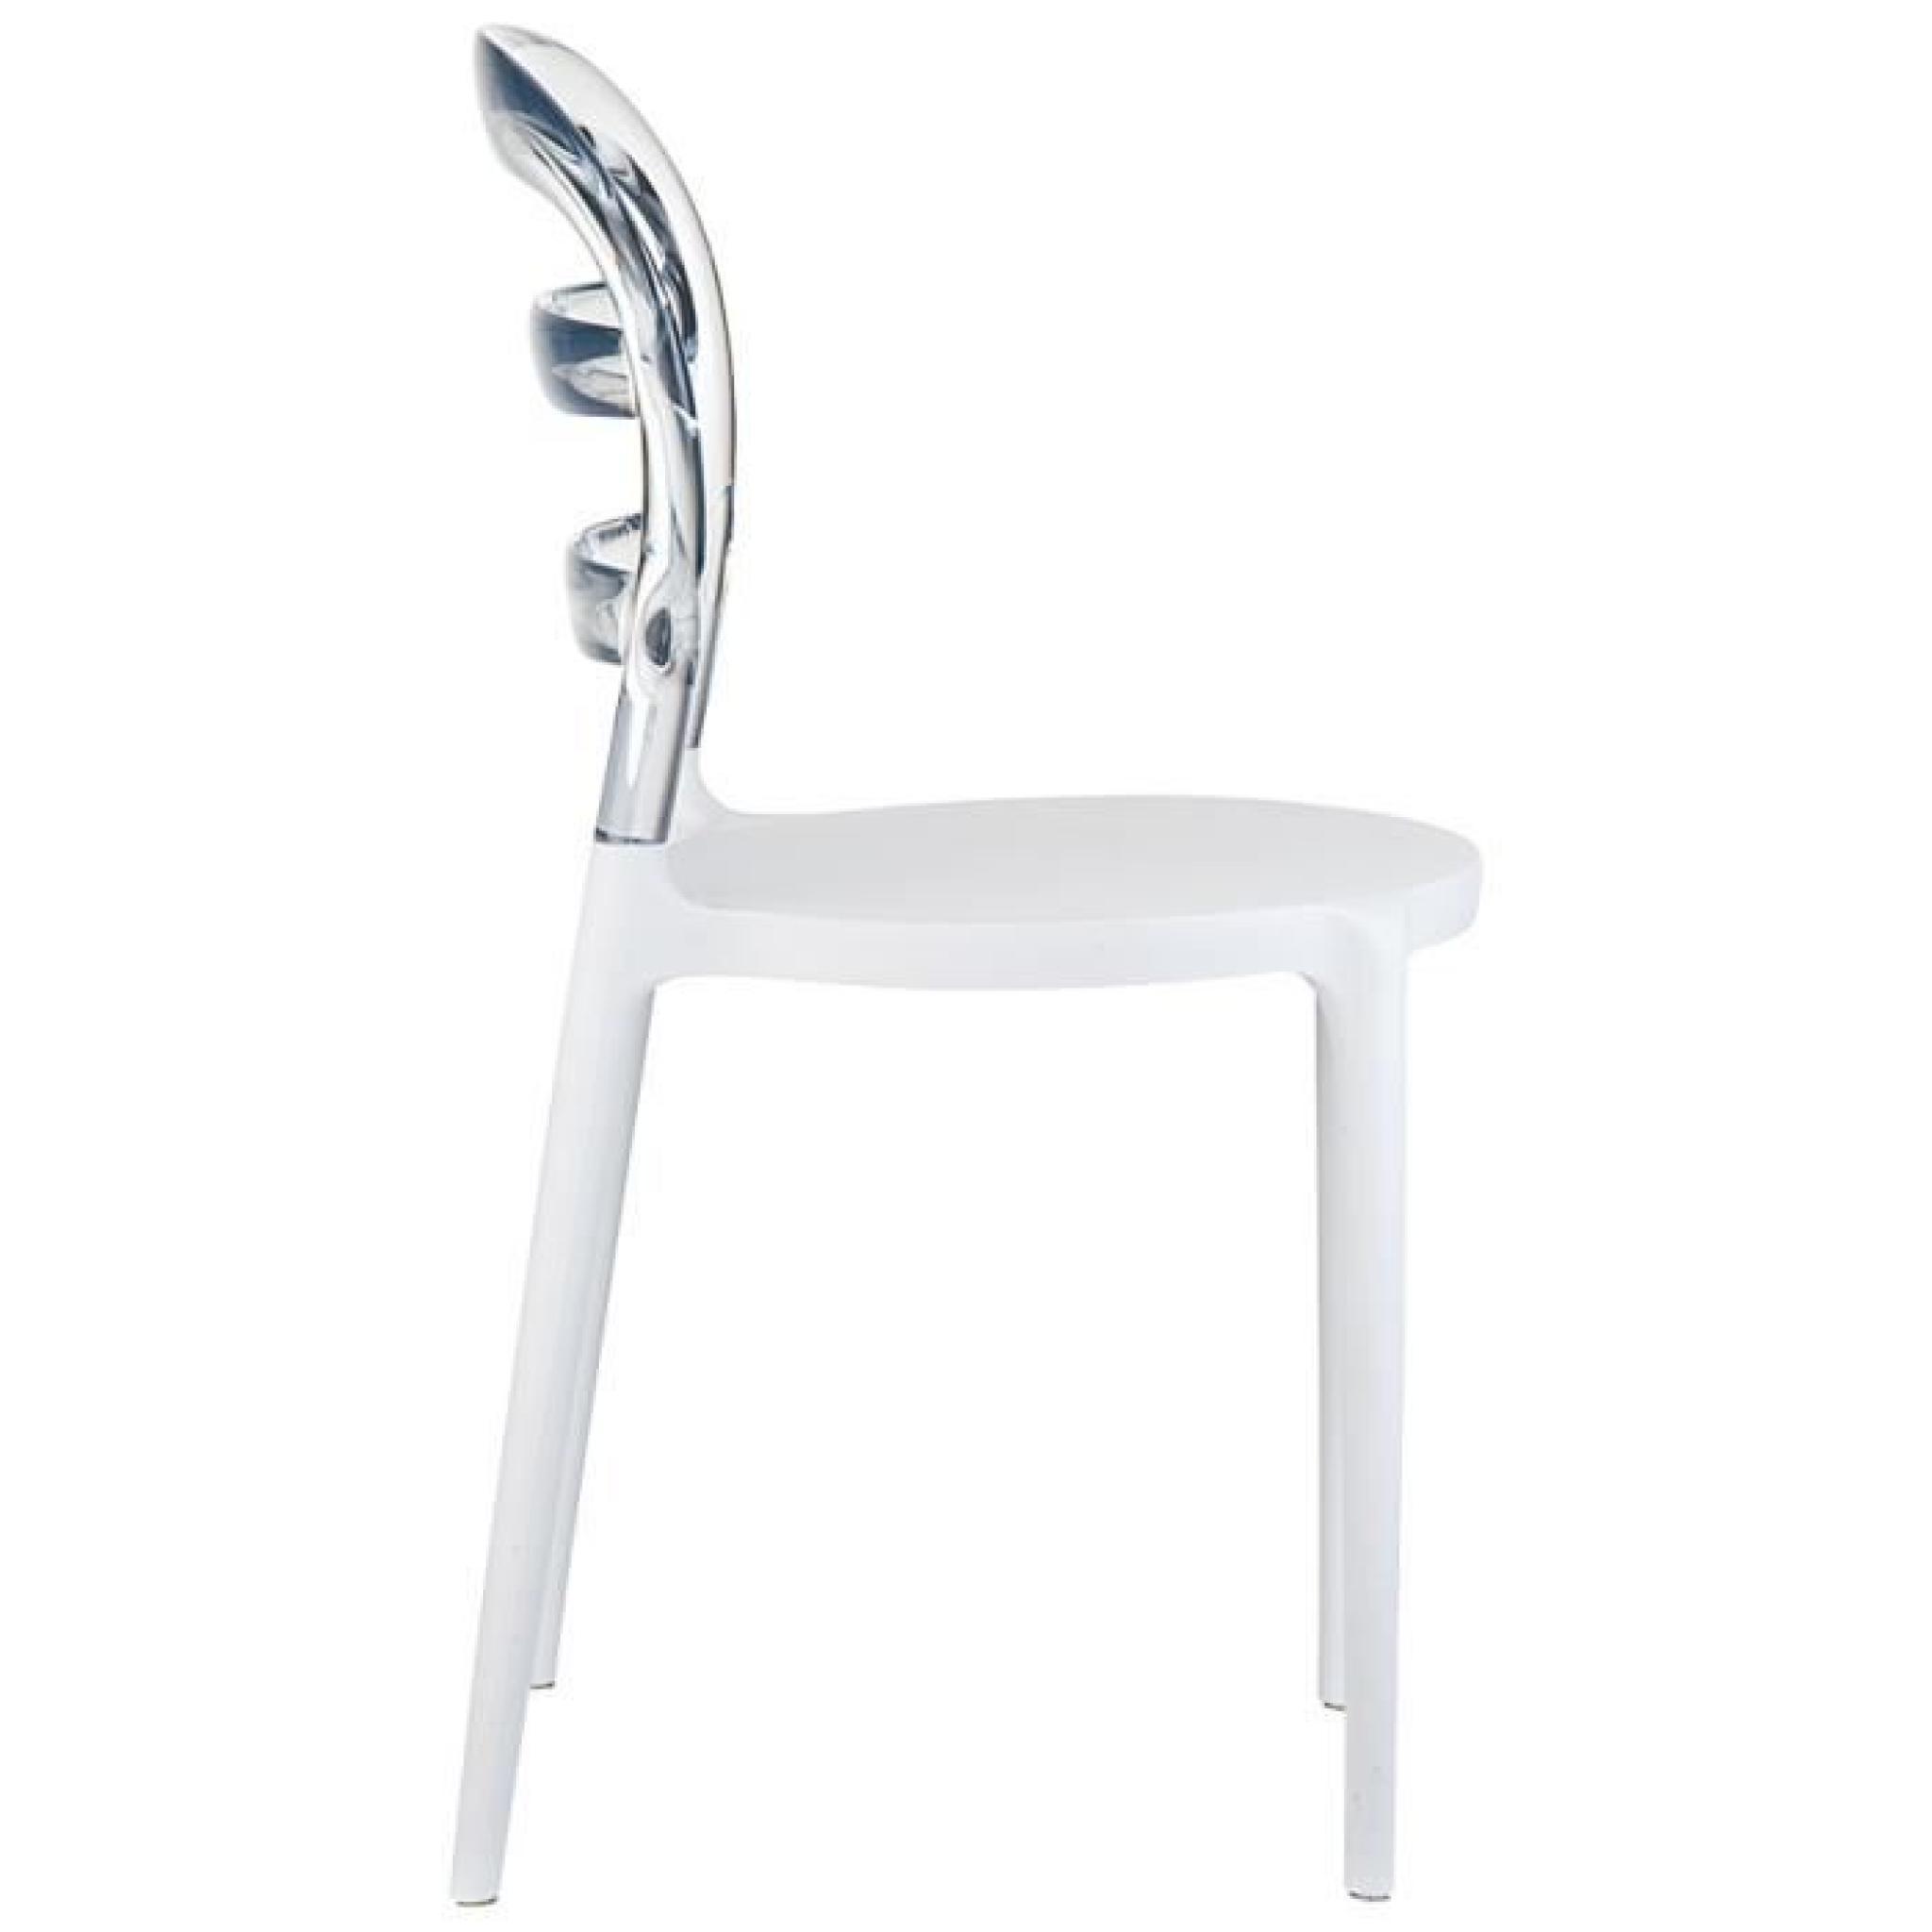 Chaise Design BARO Blanche Et Transparente En Pas Cher